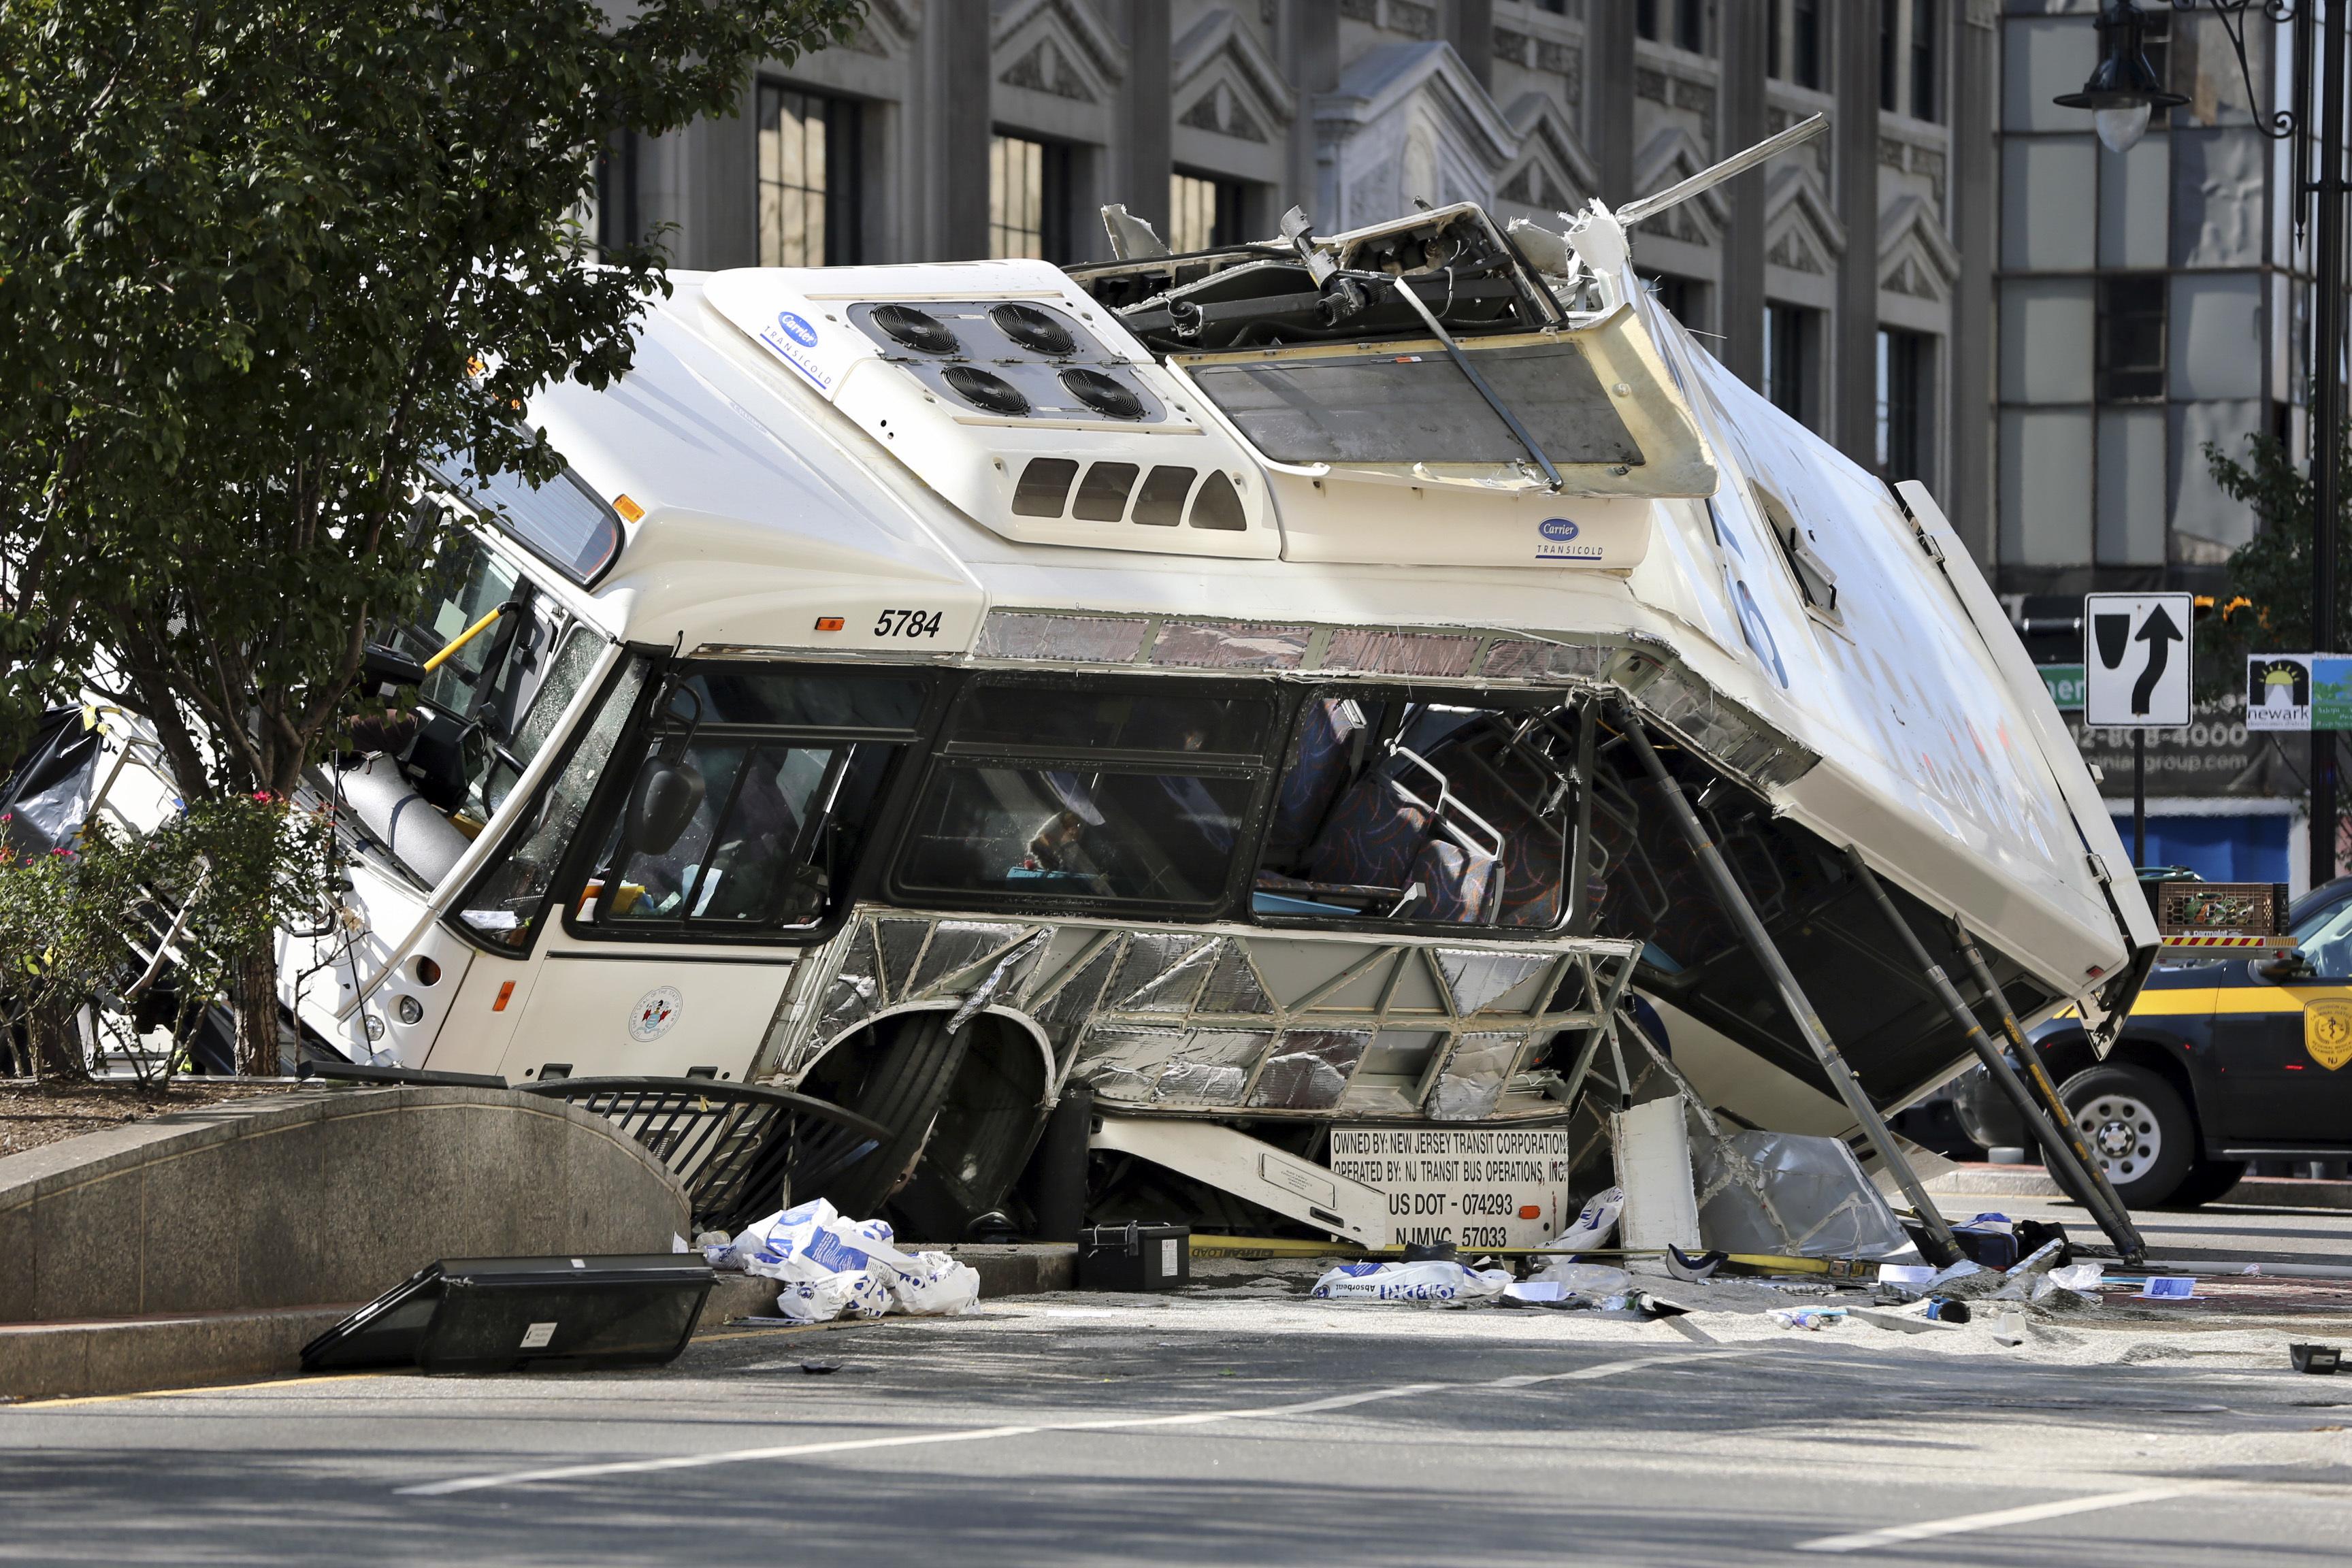 Newark, NJ - Video Of Deadly Bus Crash Released